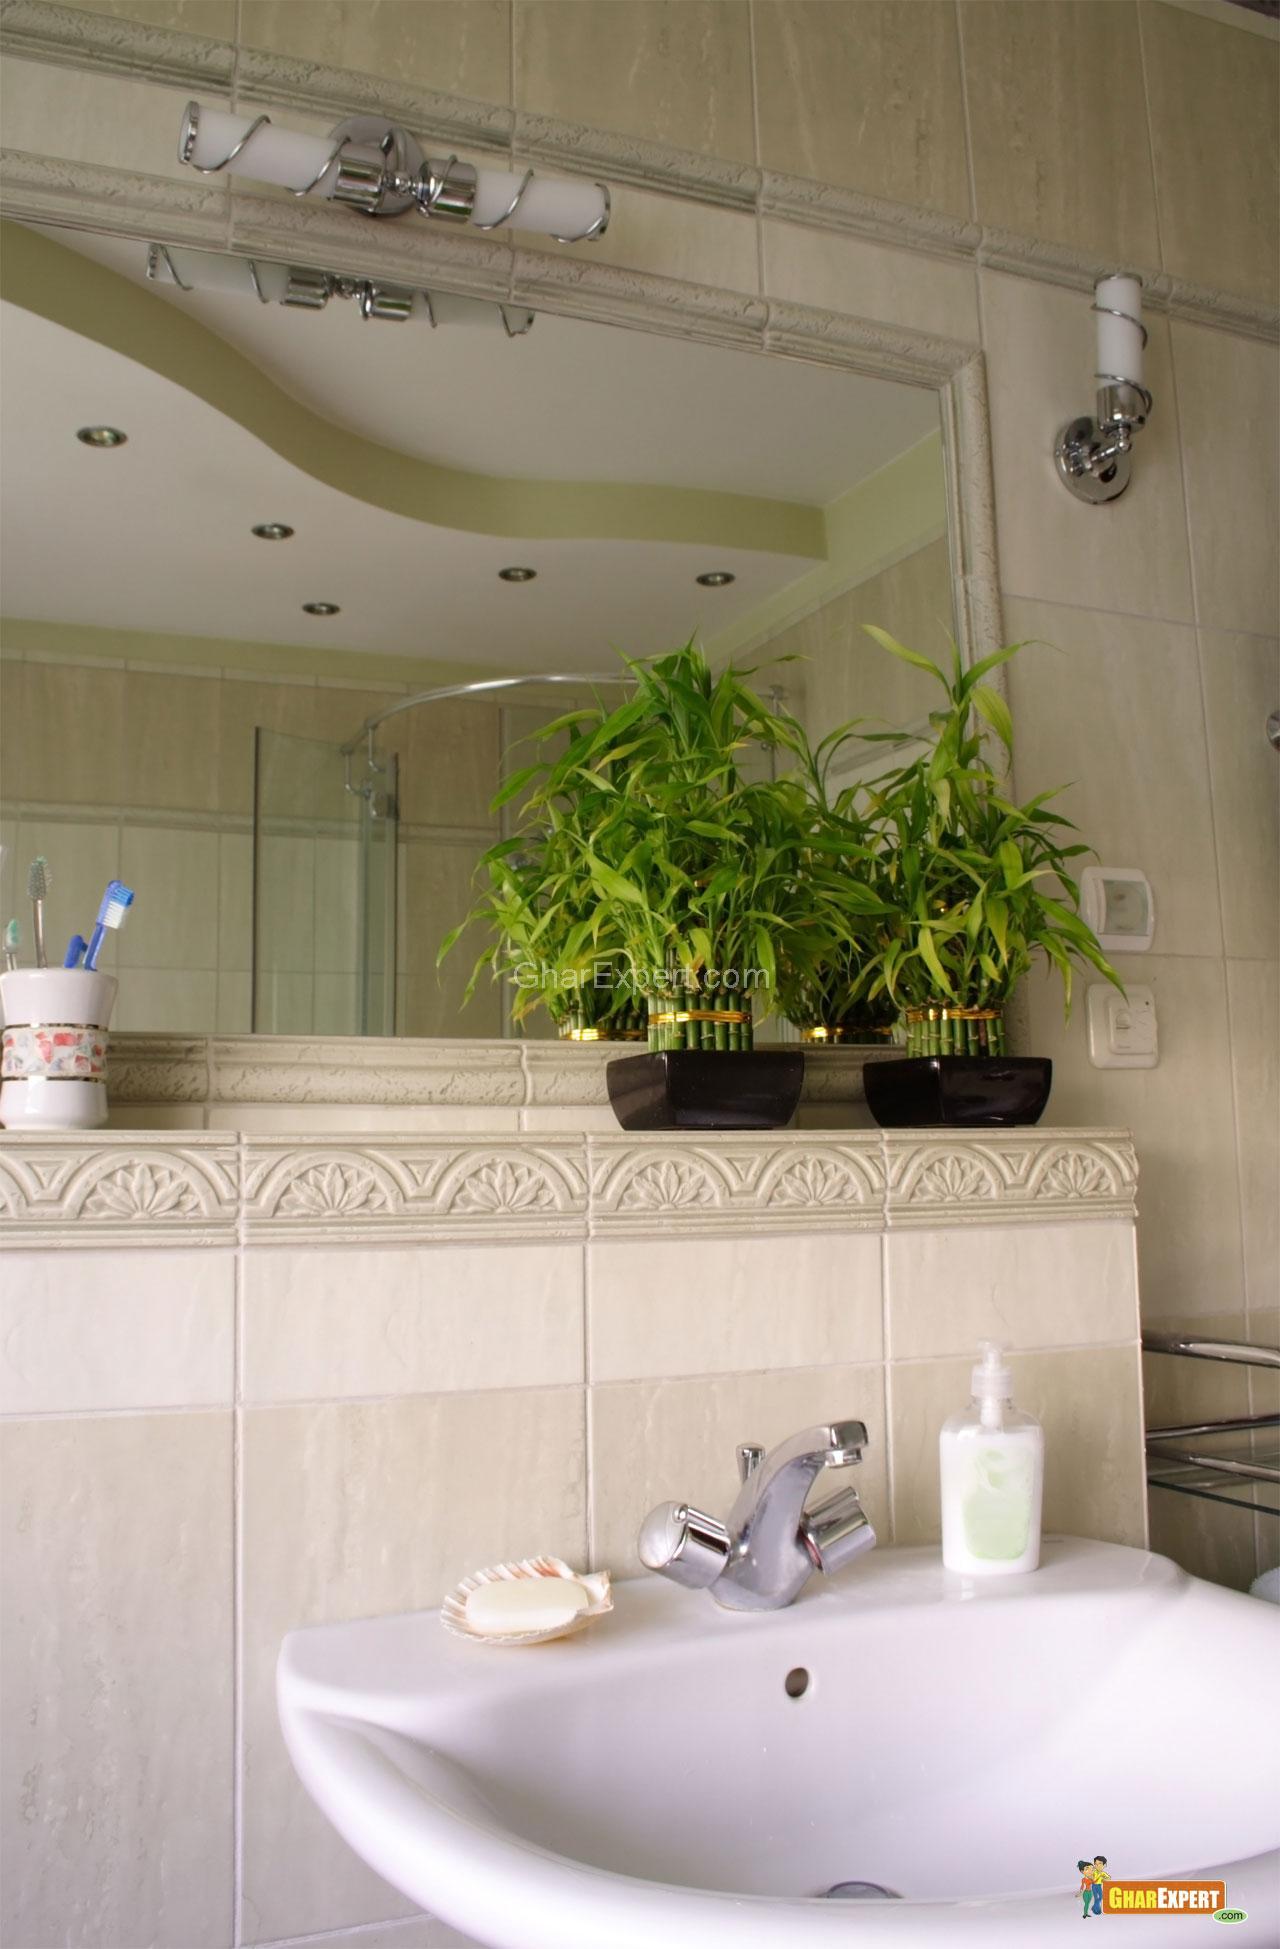 Plants in bathroom - Houseplants for the bathroom ...